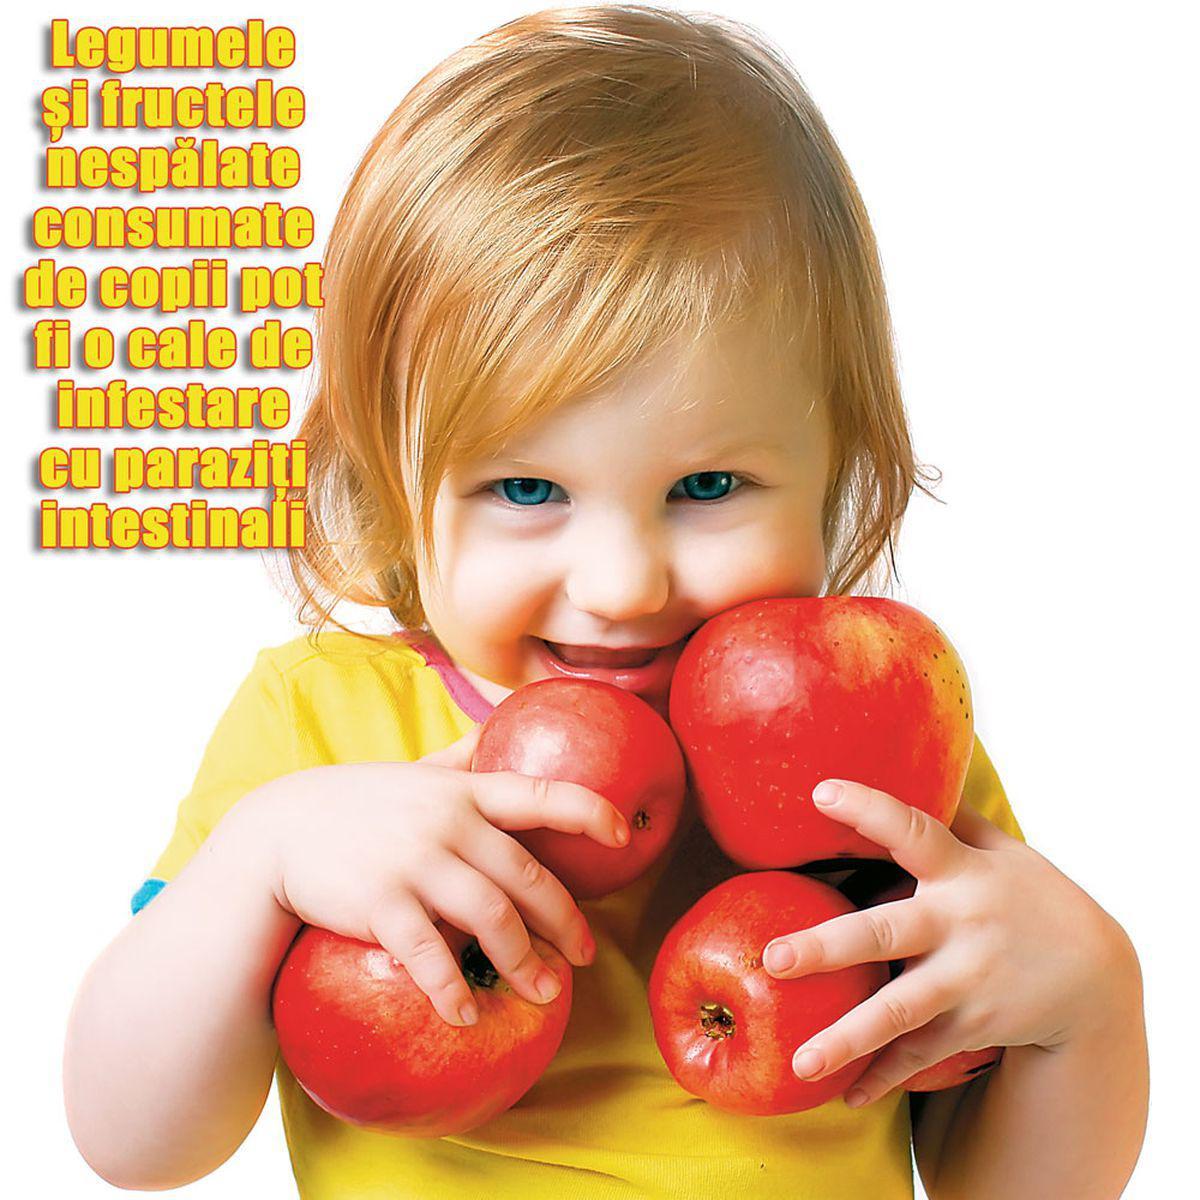 gel antihelmintic preparate antihelmintice pentru copii de 8 ani